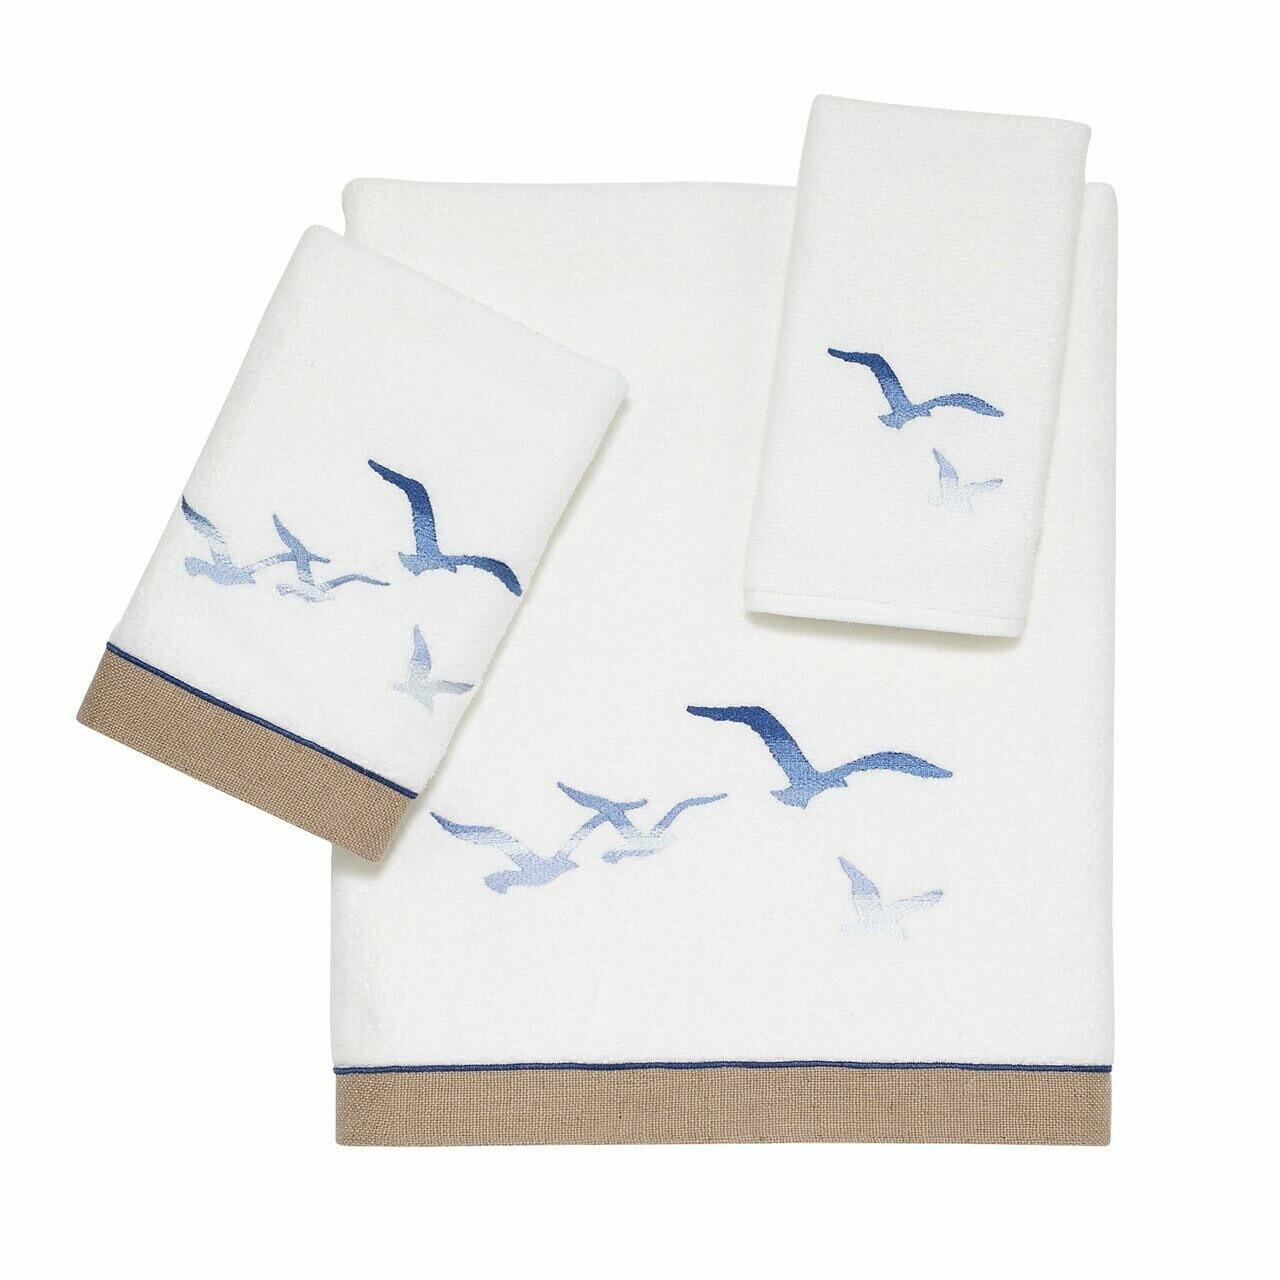 Seagulls Bath Towel